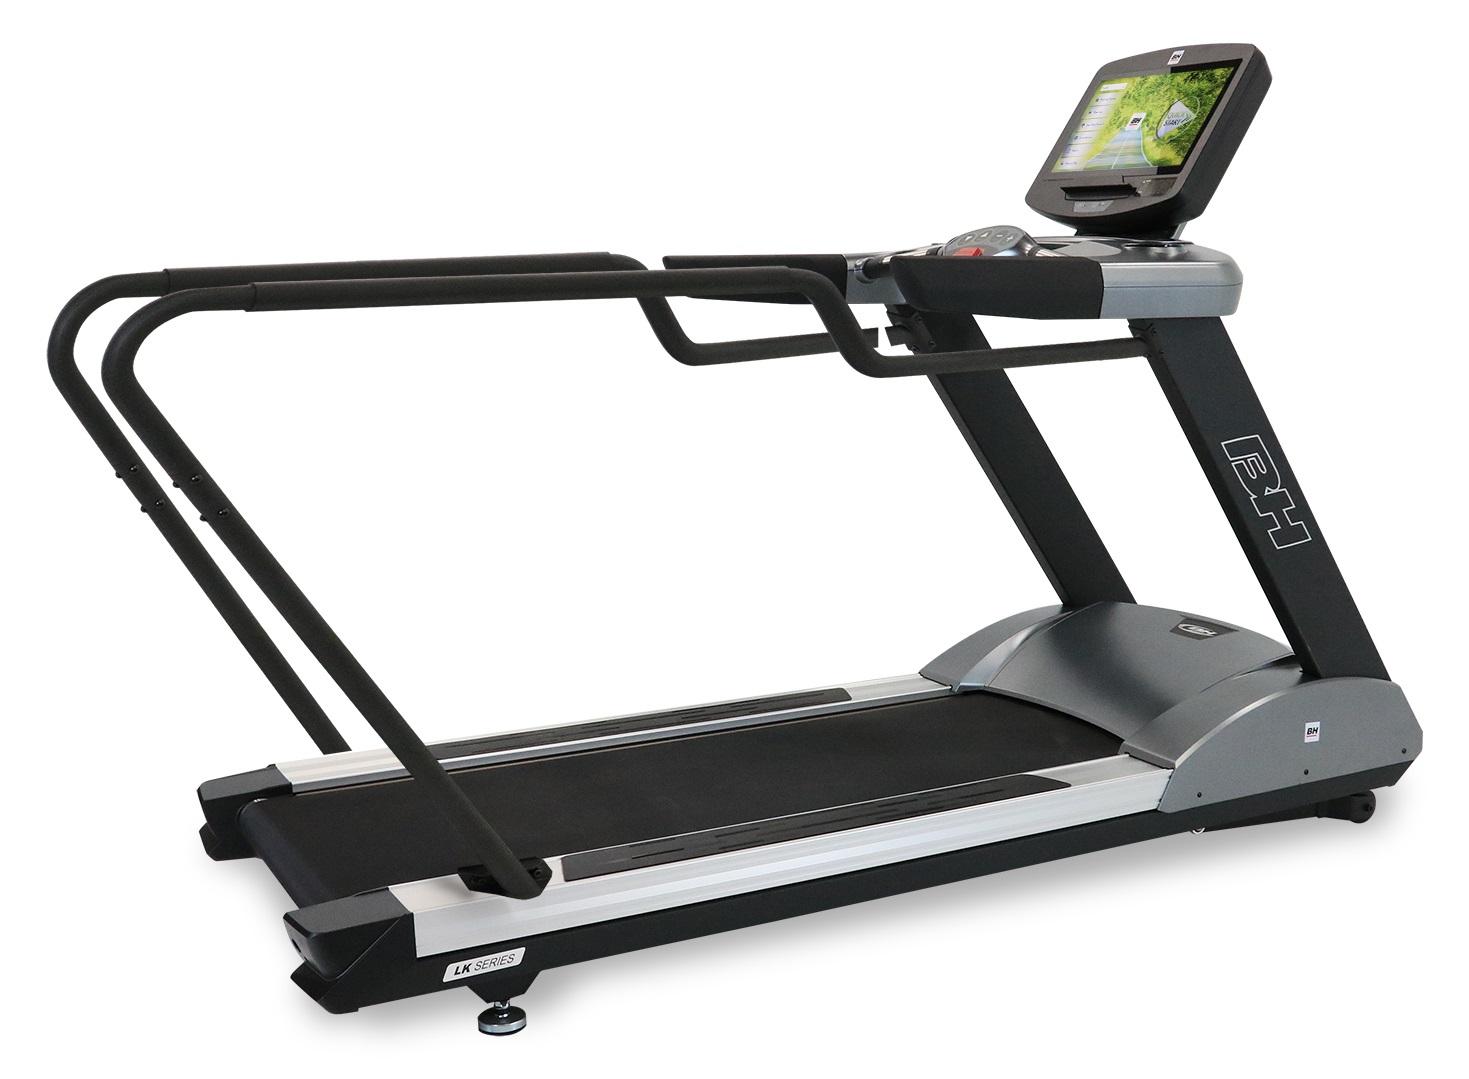 BH Fitness LK7Med Medical Handrails for LK700T CORE